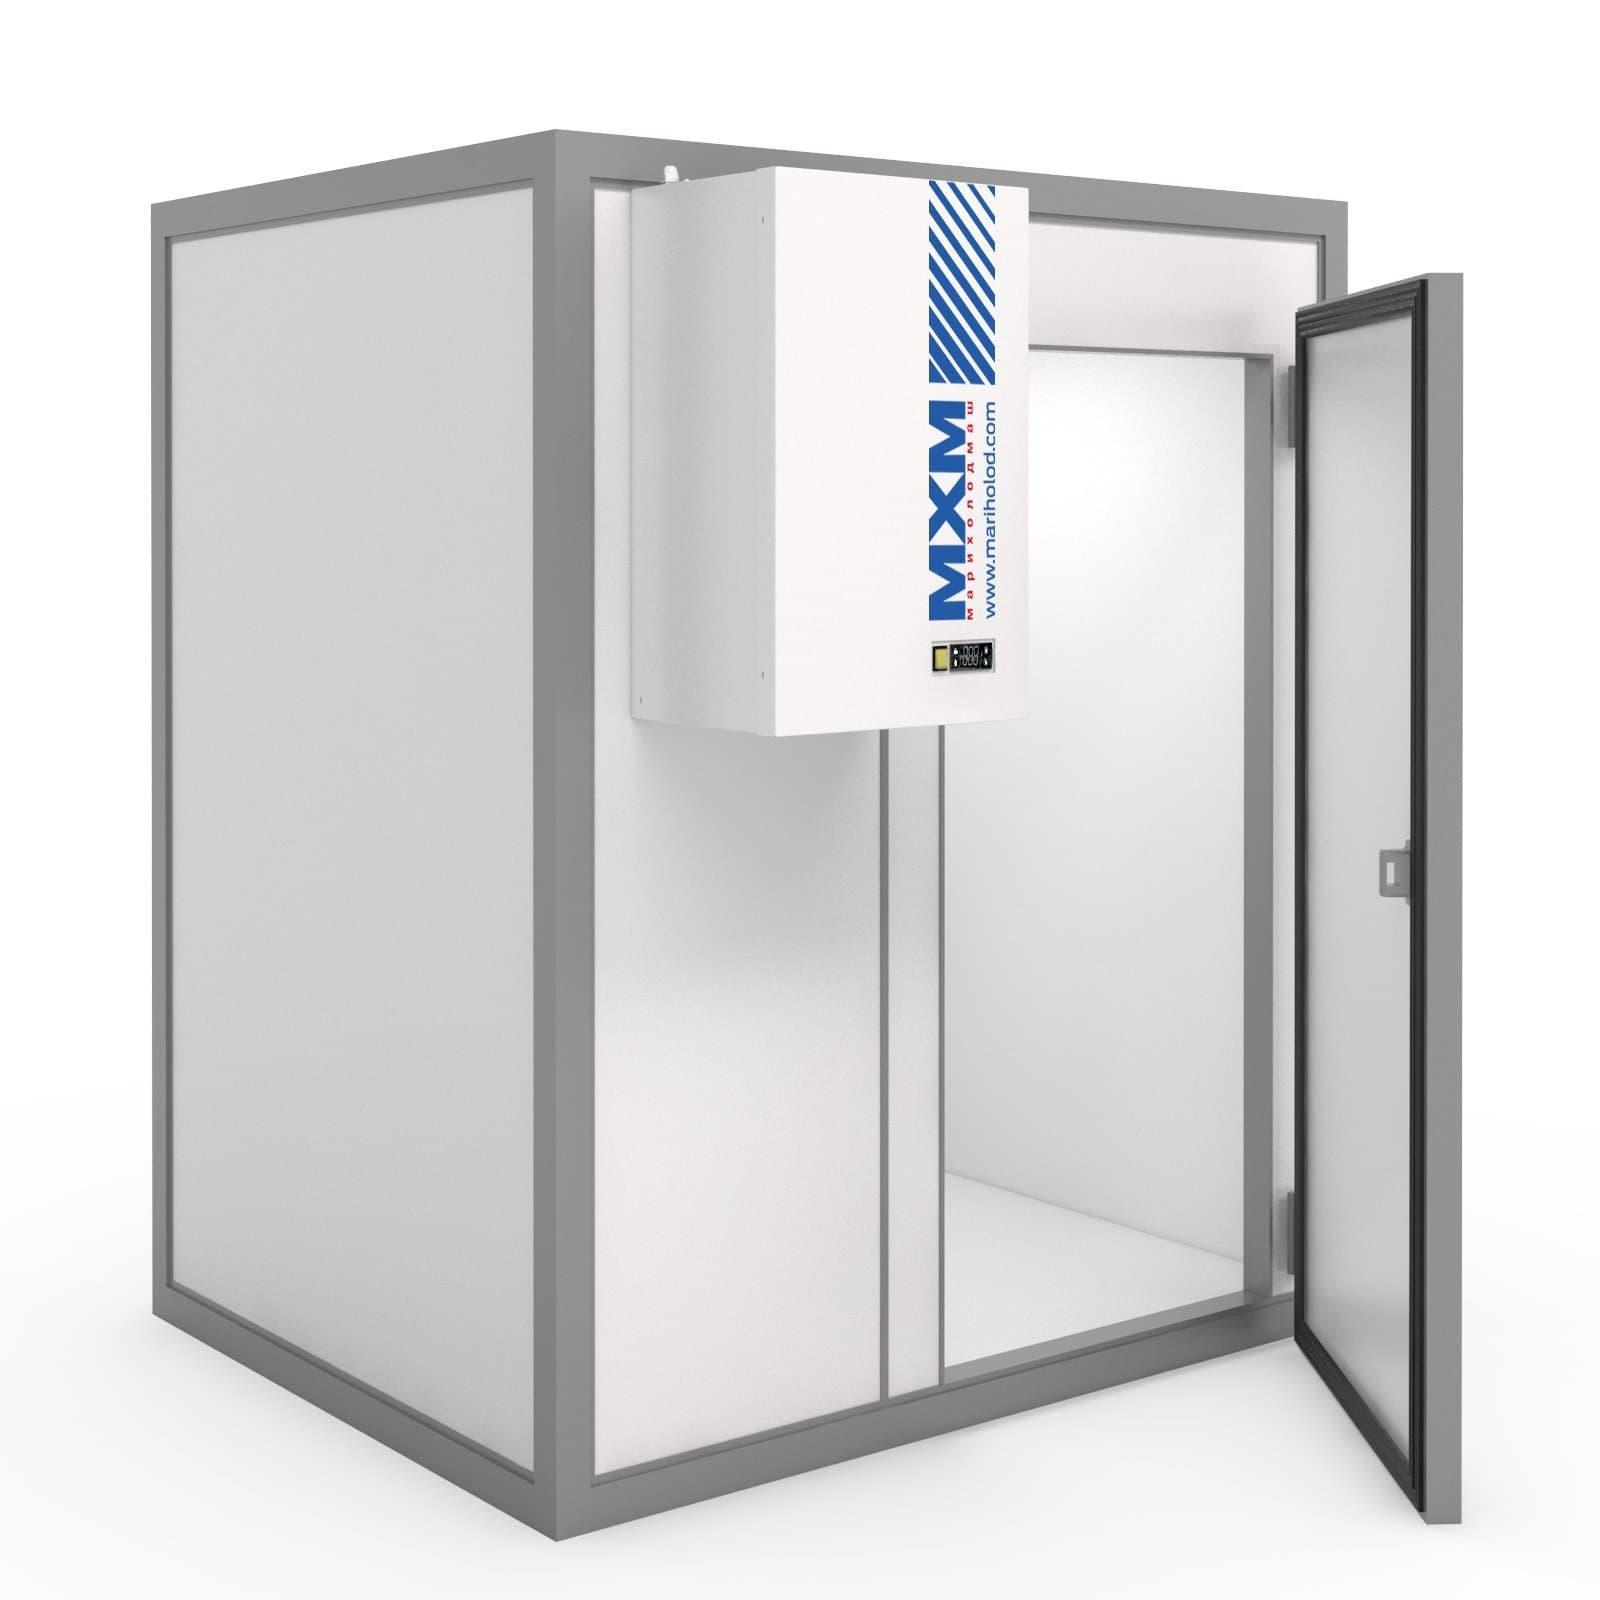 Камера холодильная МХМ КХН-9,18 1660×3160×2200